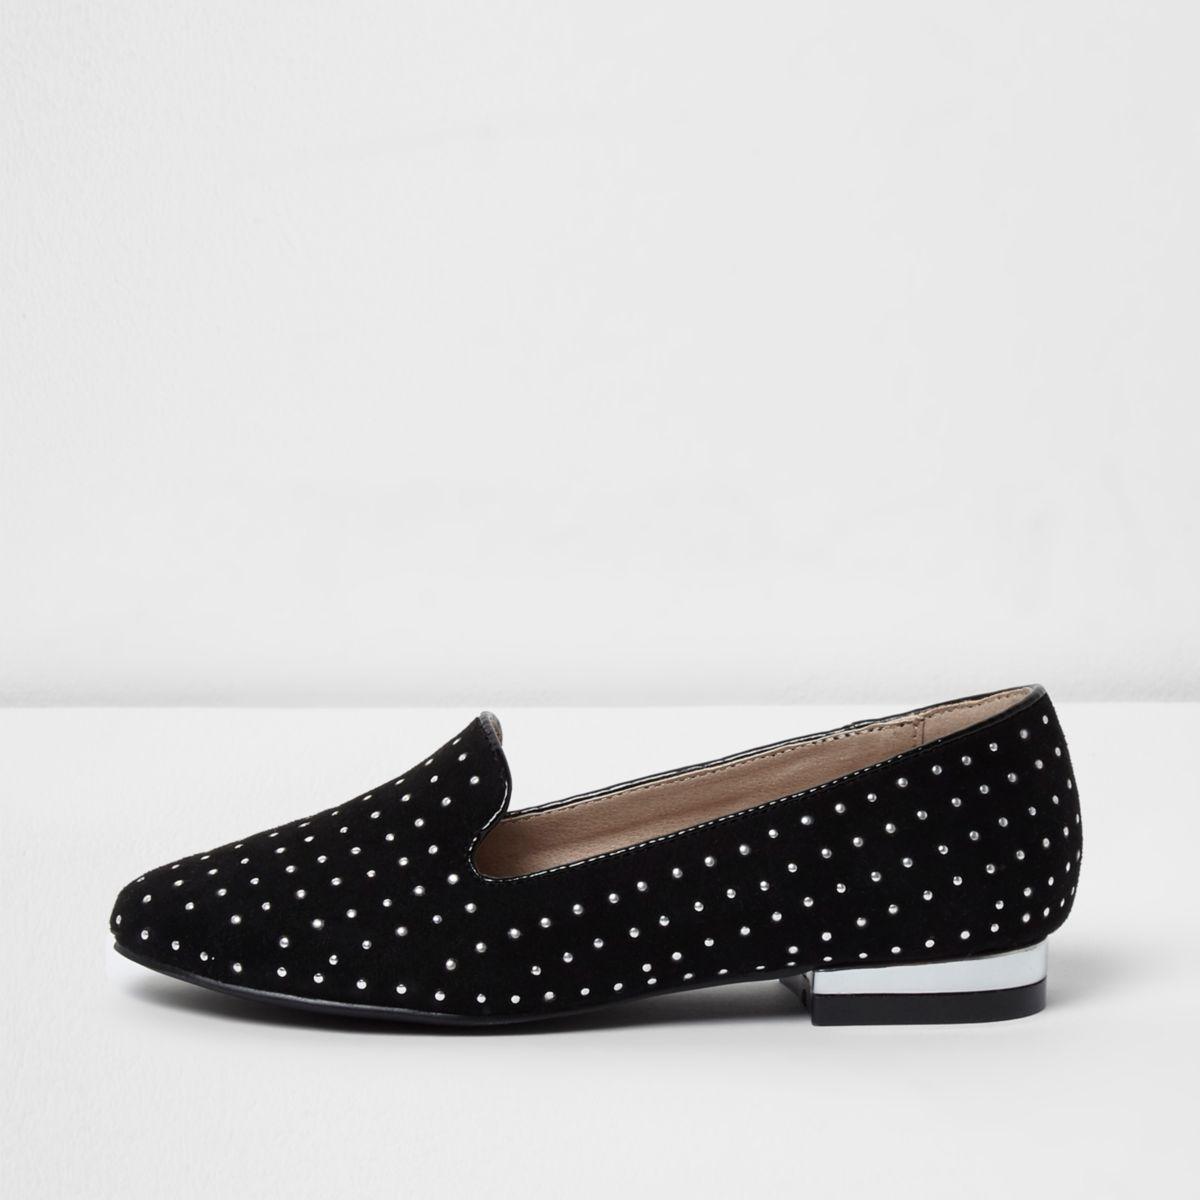 Girls black studded low block heel loafers